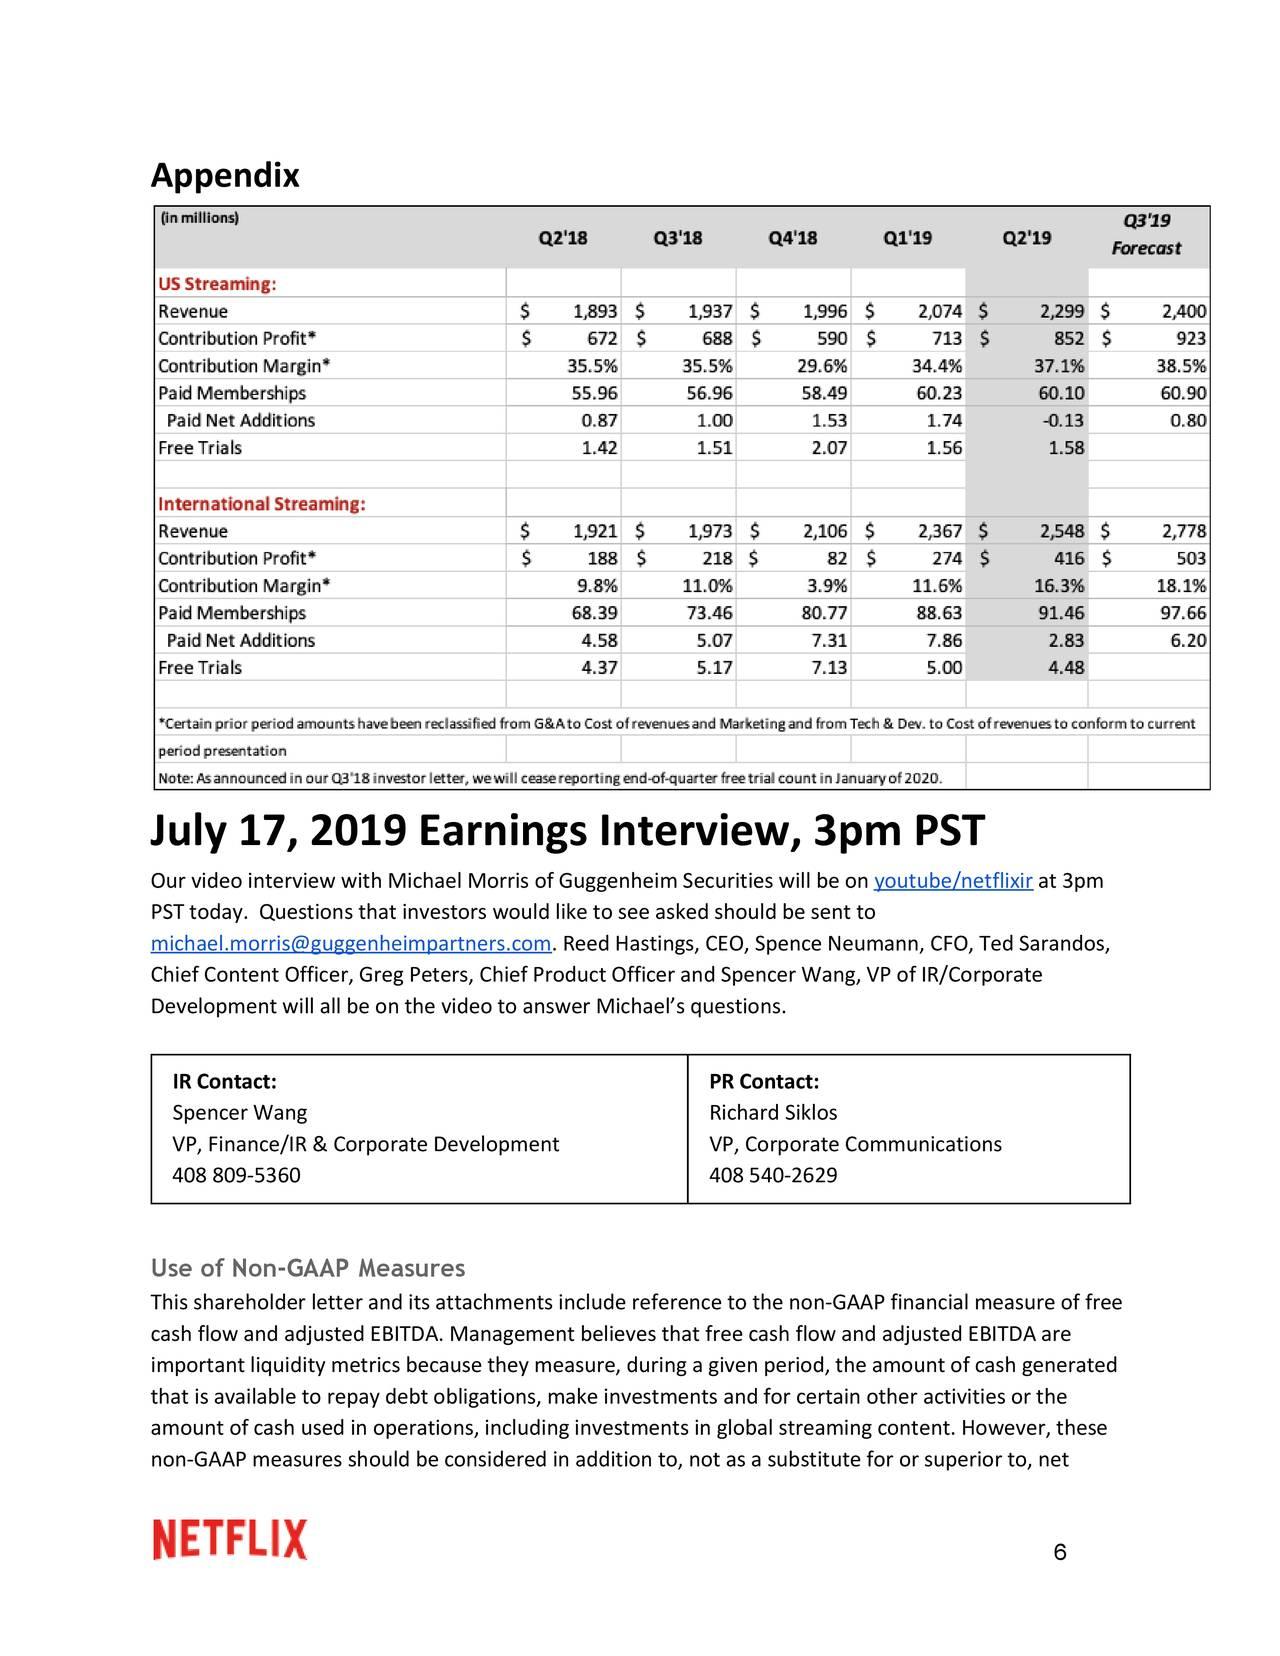 Netflix Stock Price Plunge Below $300 Level, But Analysts